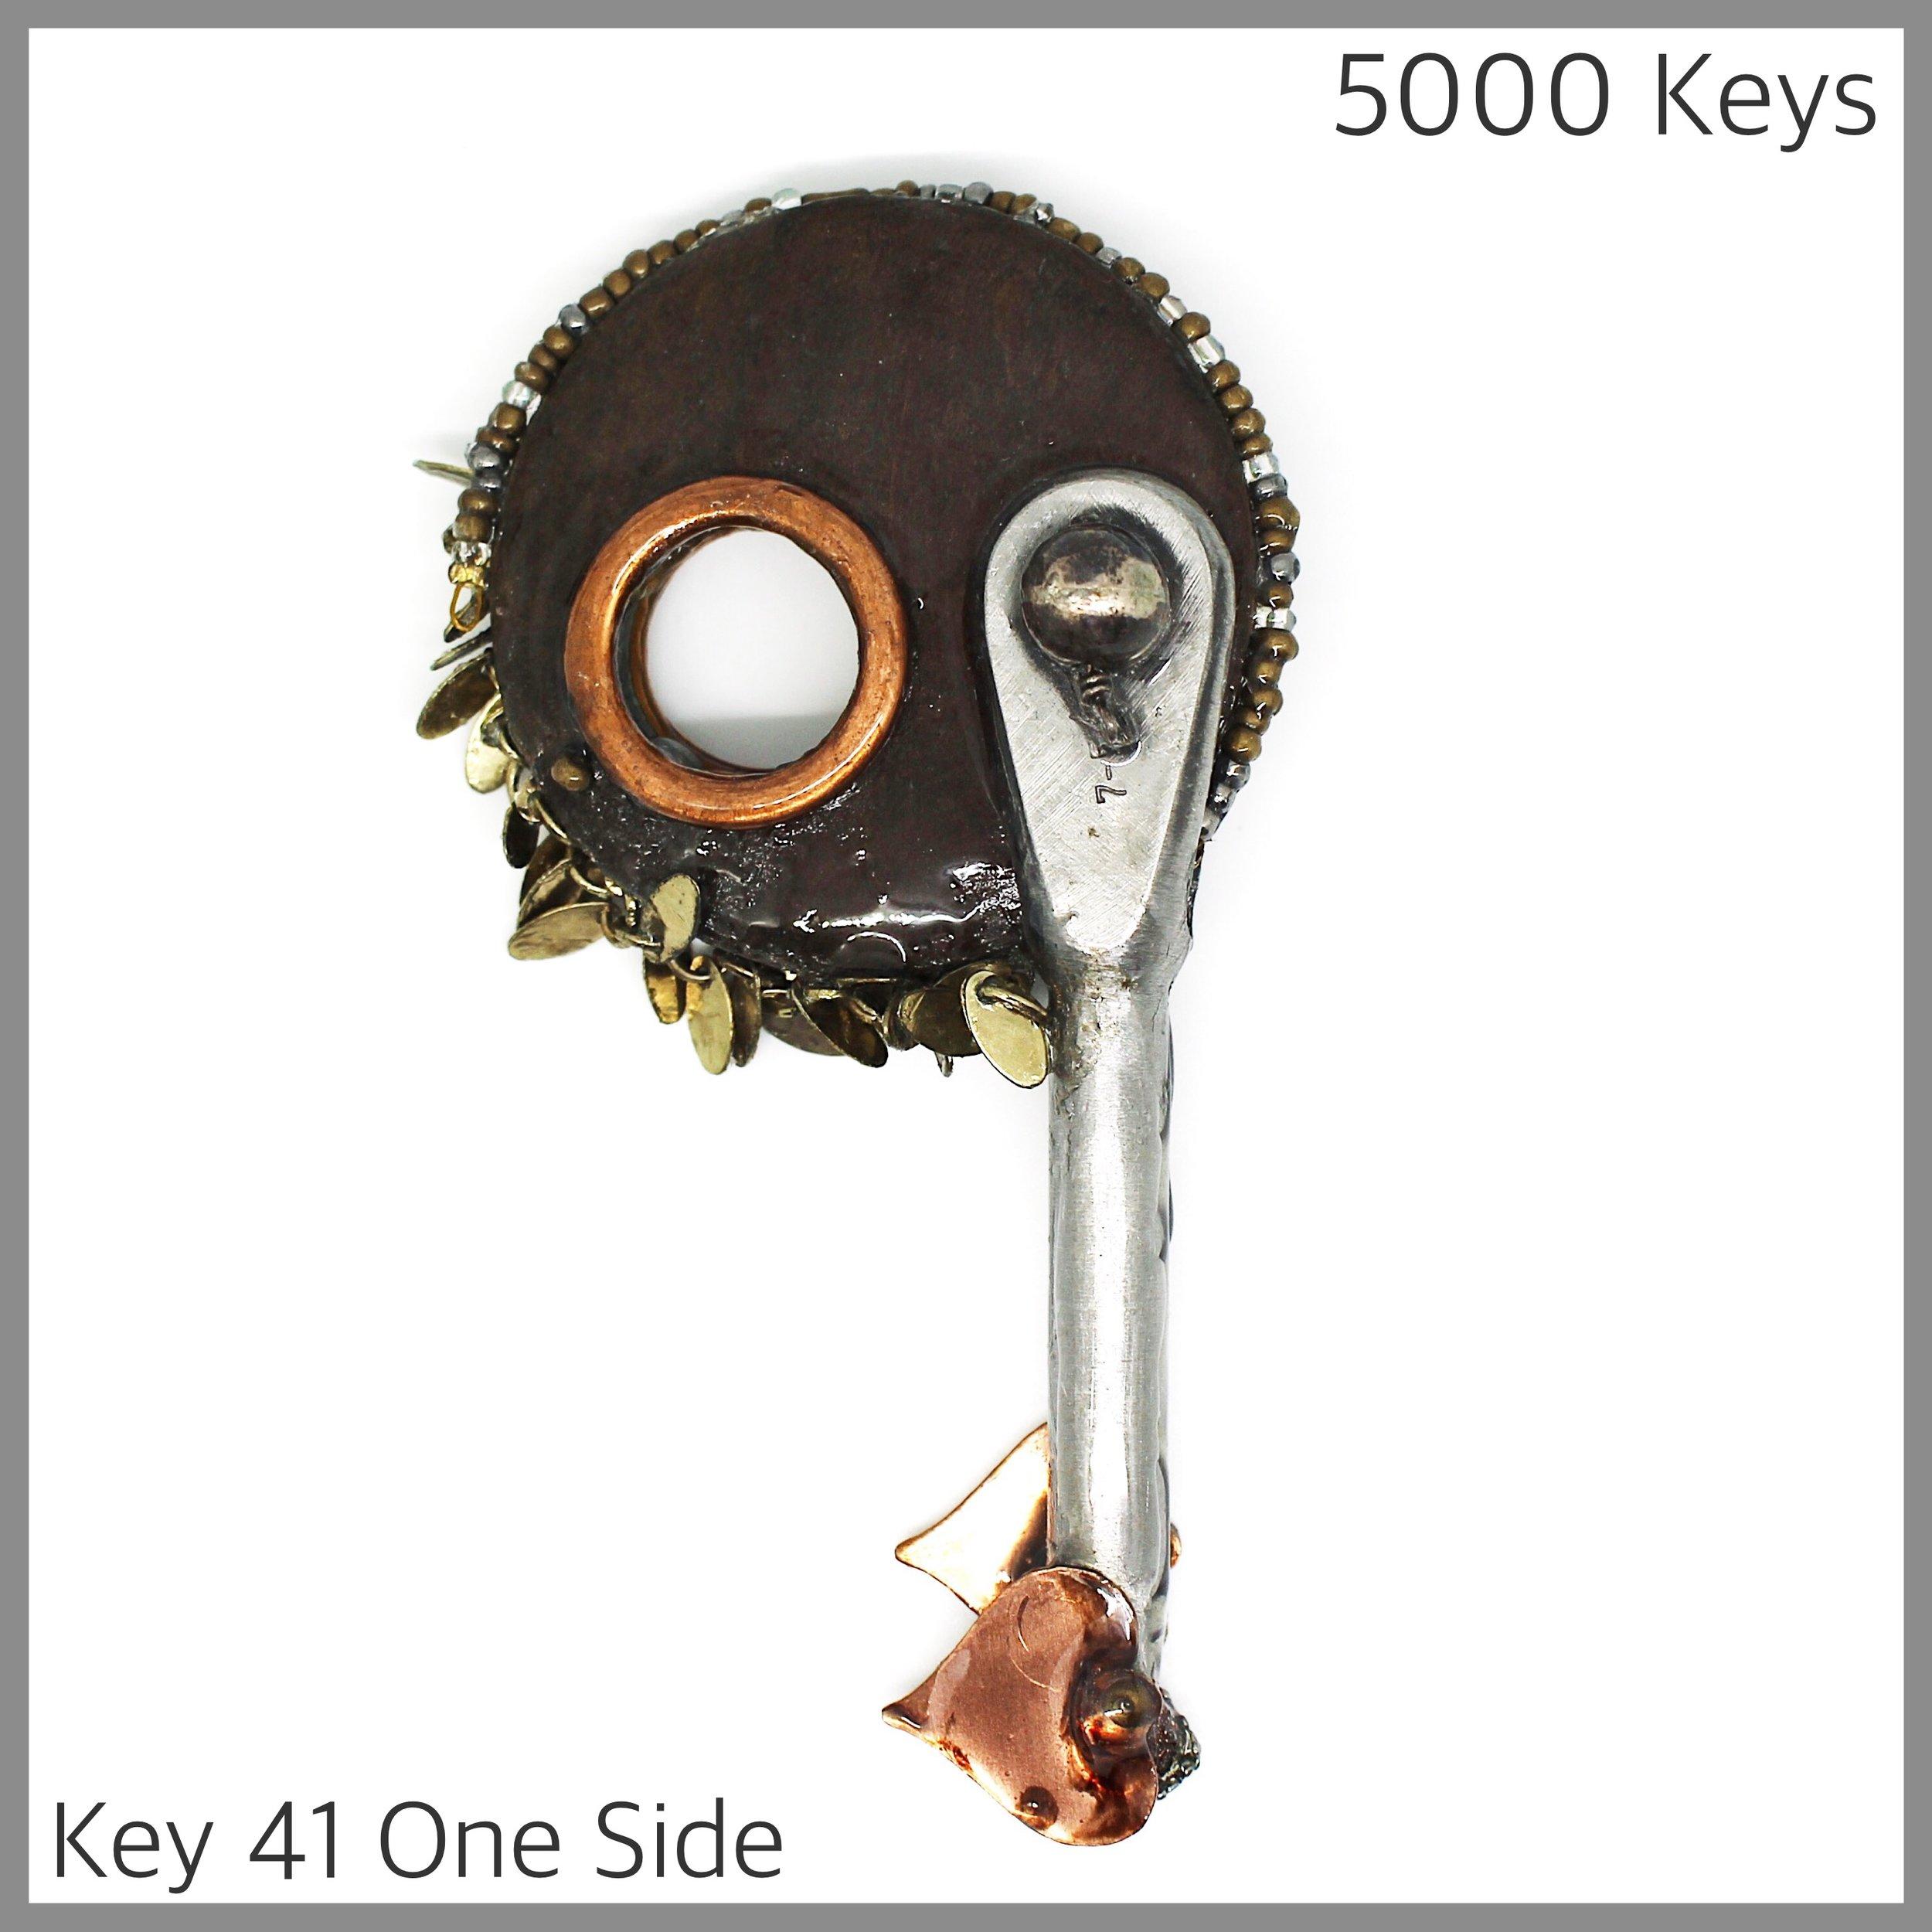 Key 41 one side - 1.JPG